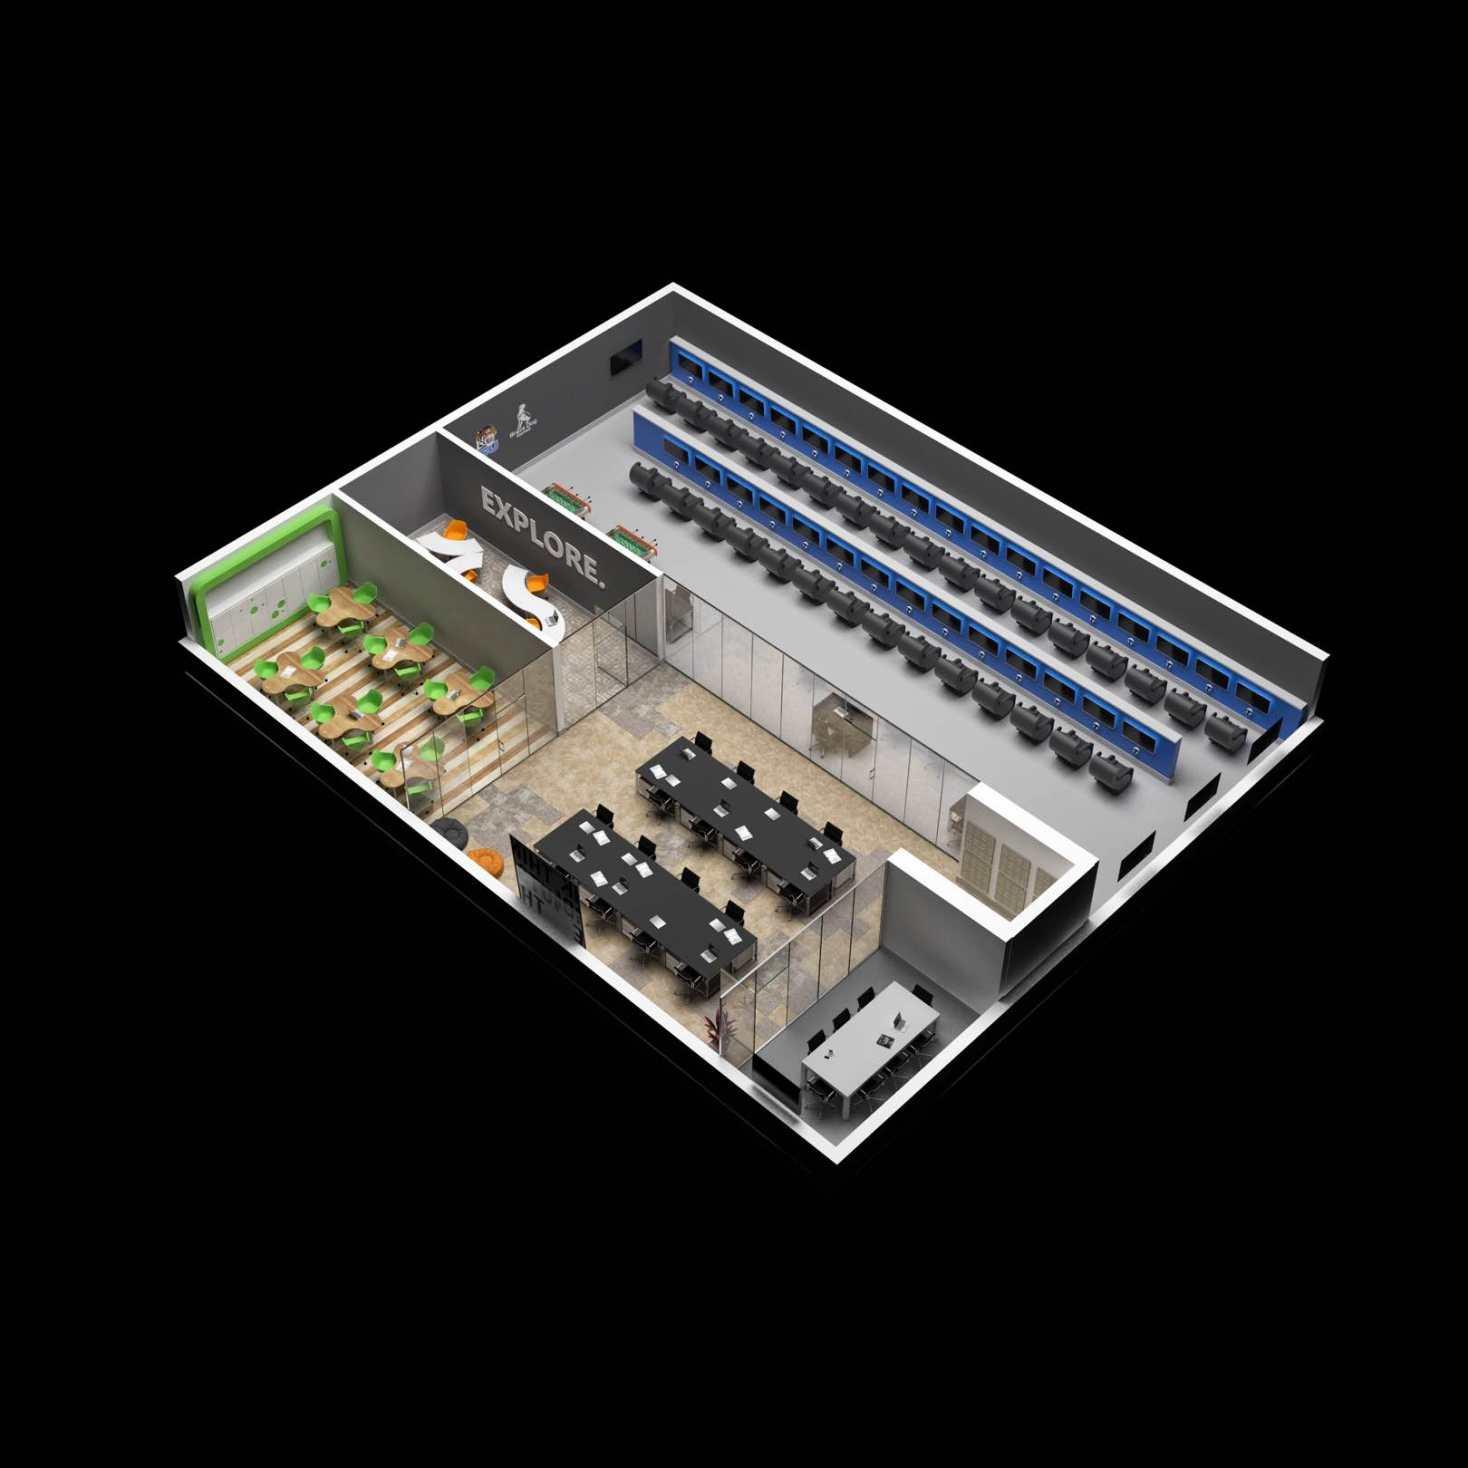 BraveDog Games Innovation Center (BDIC)